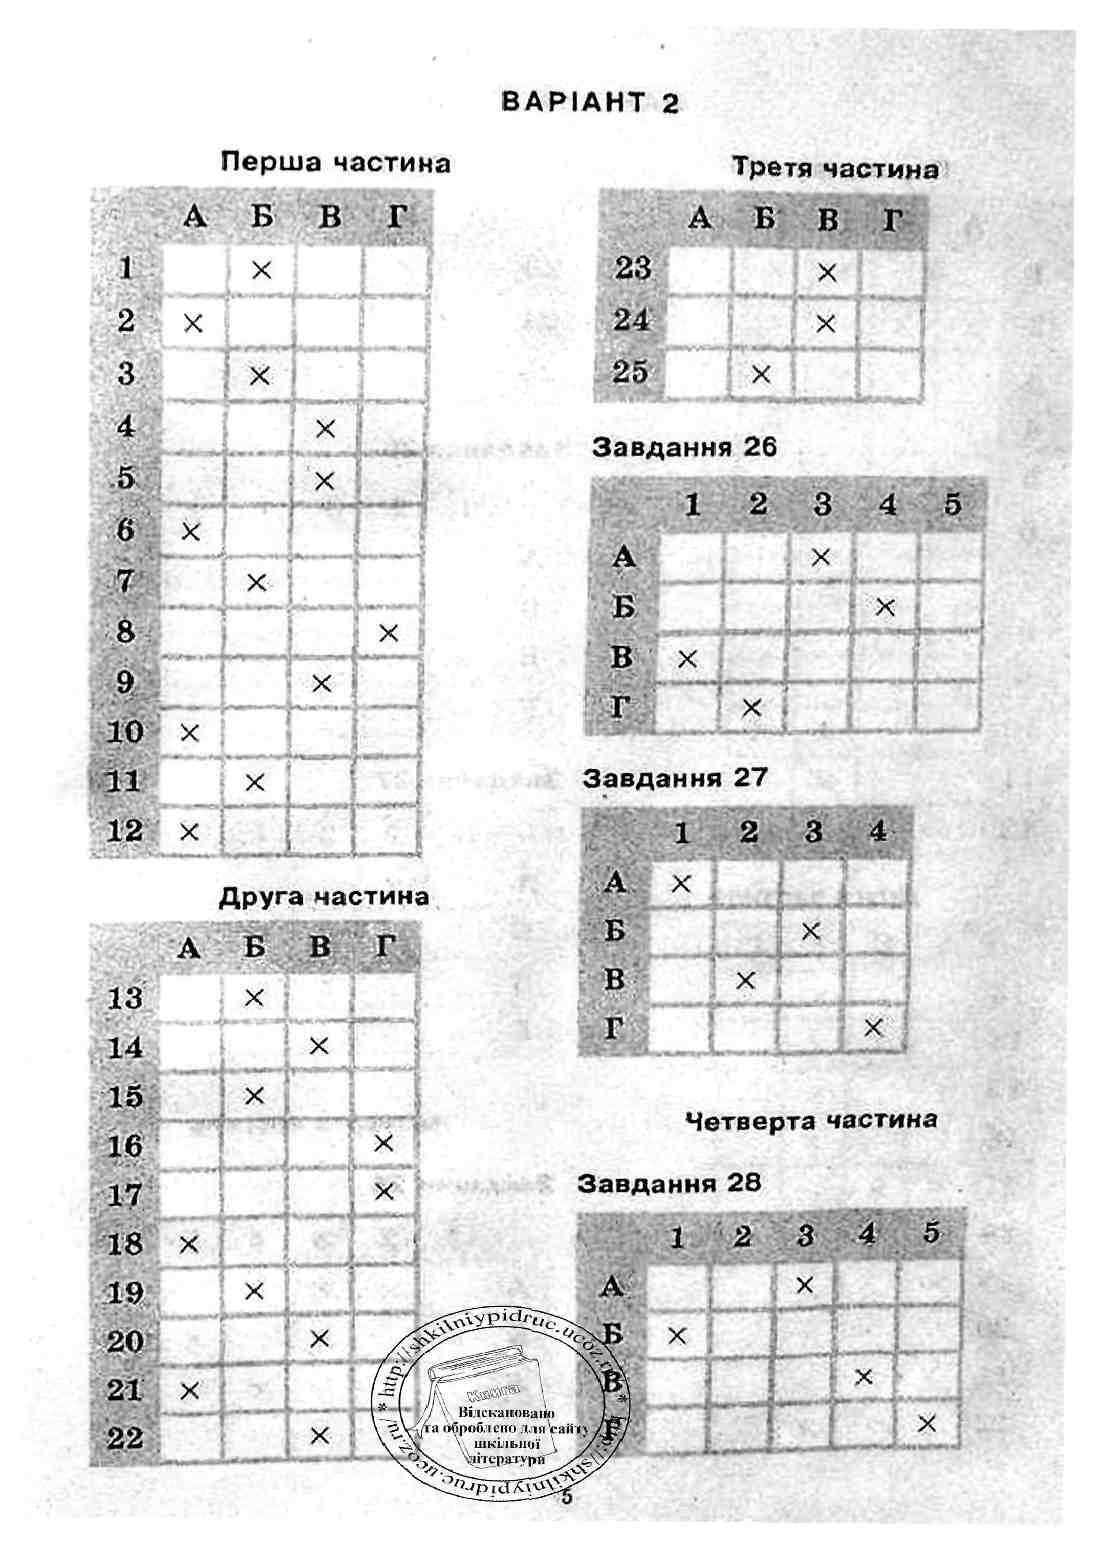 Математика дпа 2014 9 класс решебник